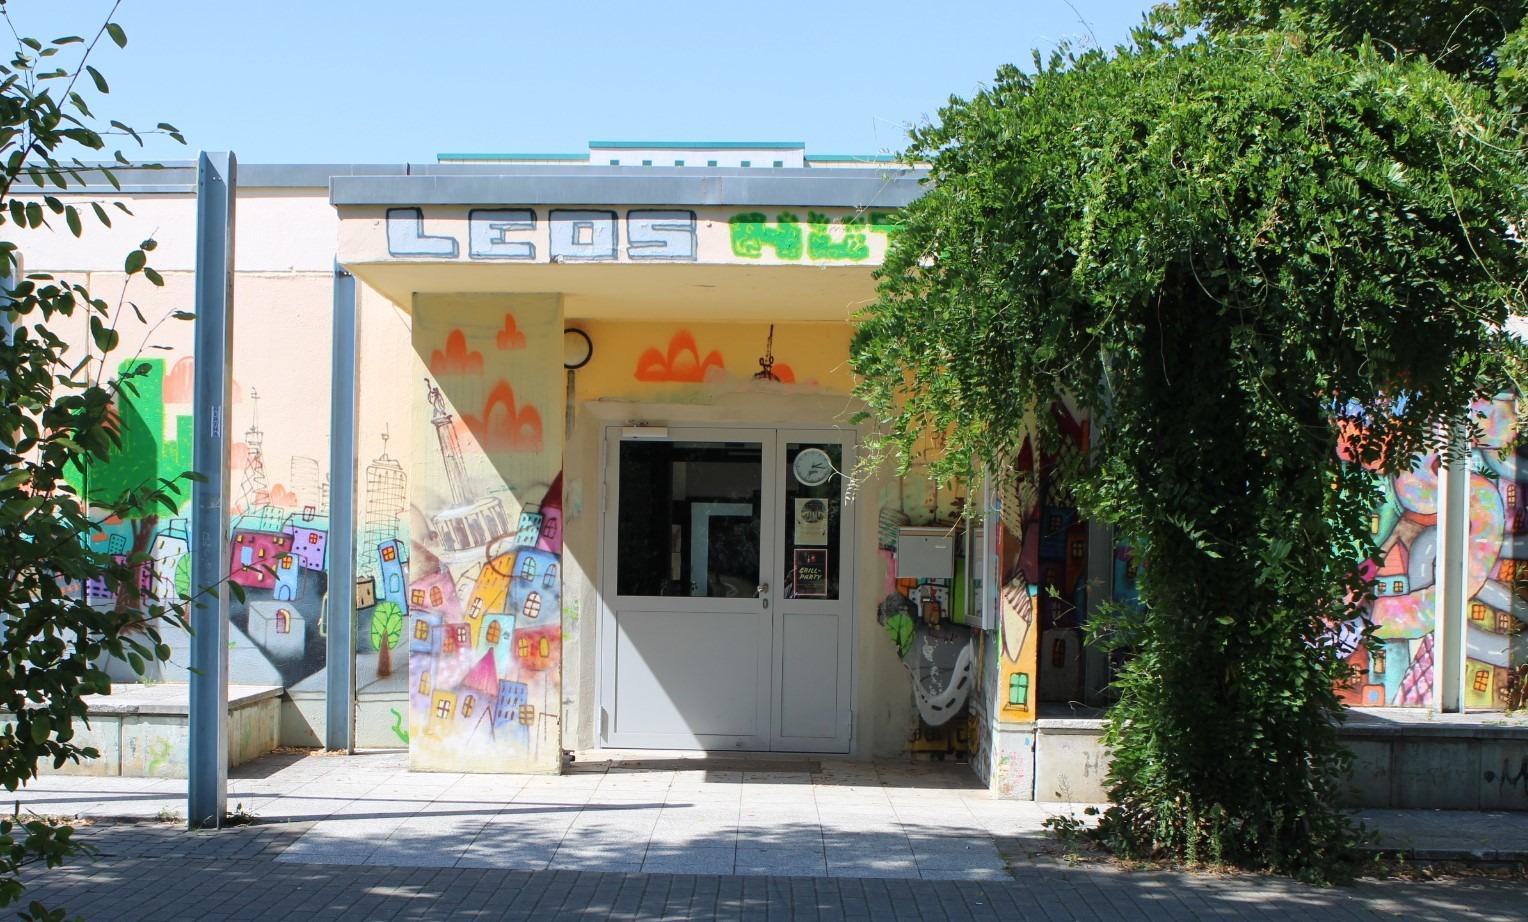 Leos-Hütte-Eingang